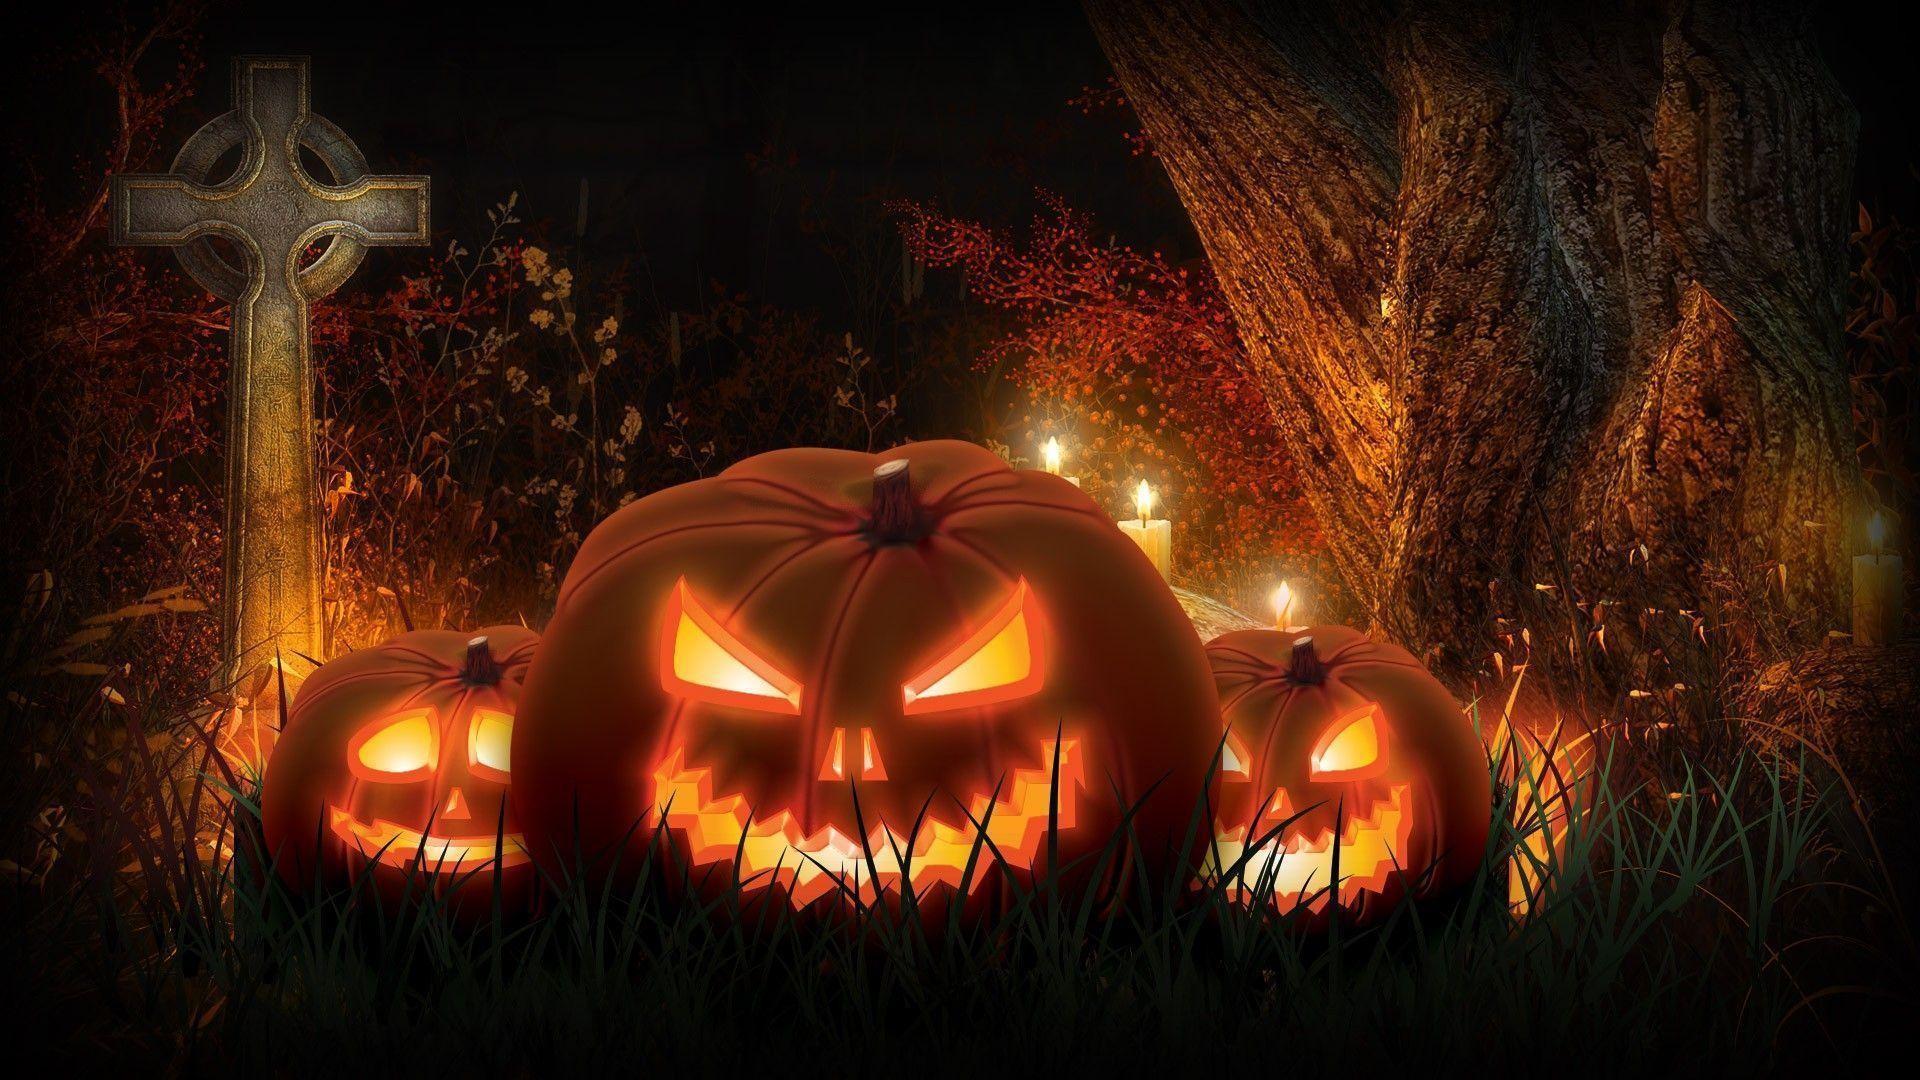 Scary Halloween Pumpkin Wallpaper 1080p – ToObjects.